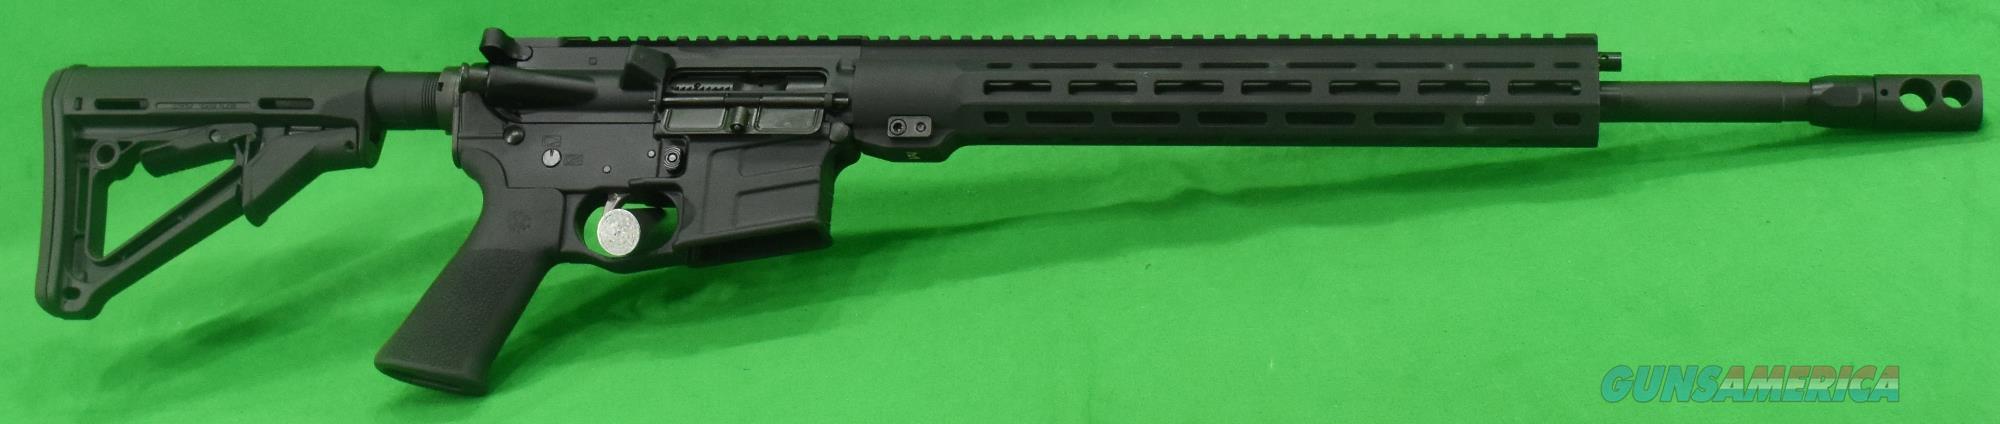 MSR 15 Recon LRP 224Valkyrie 18In 22931  Guns